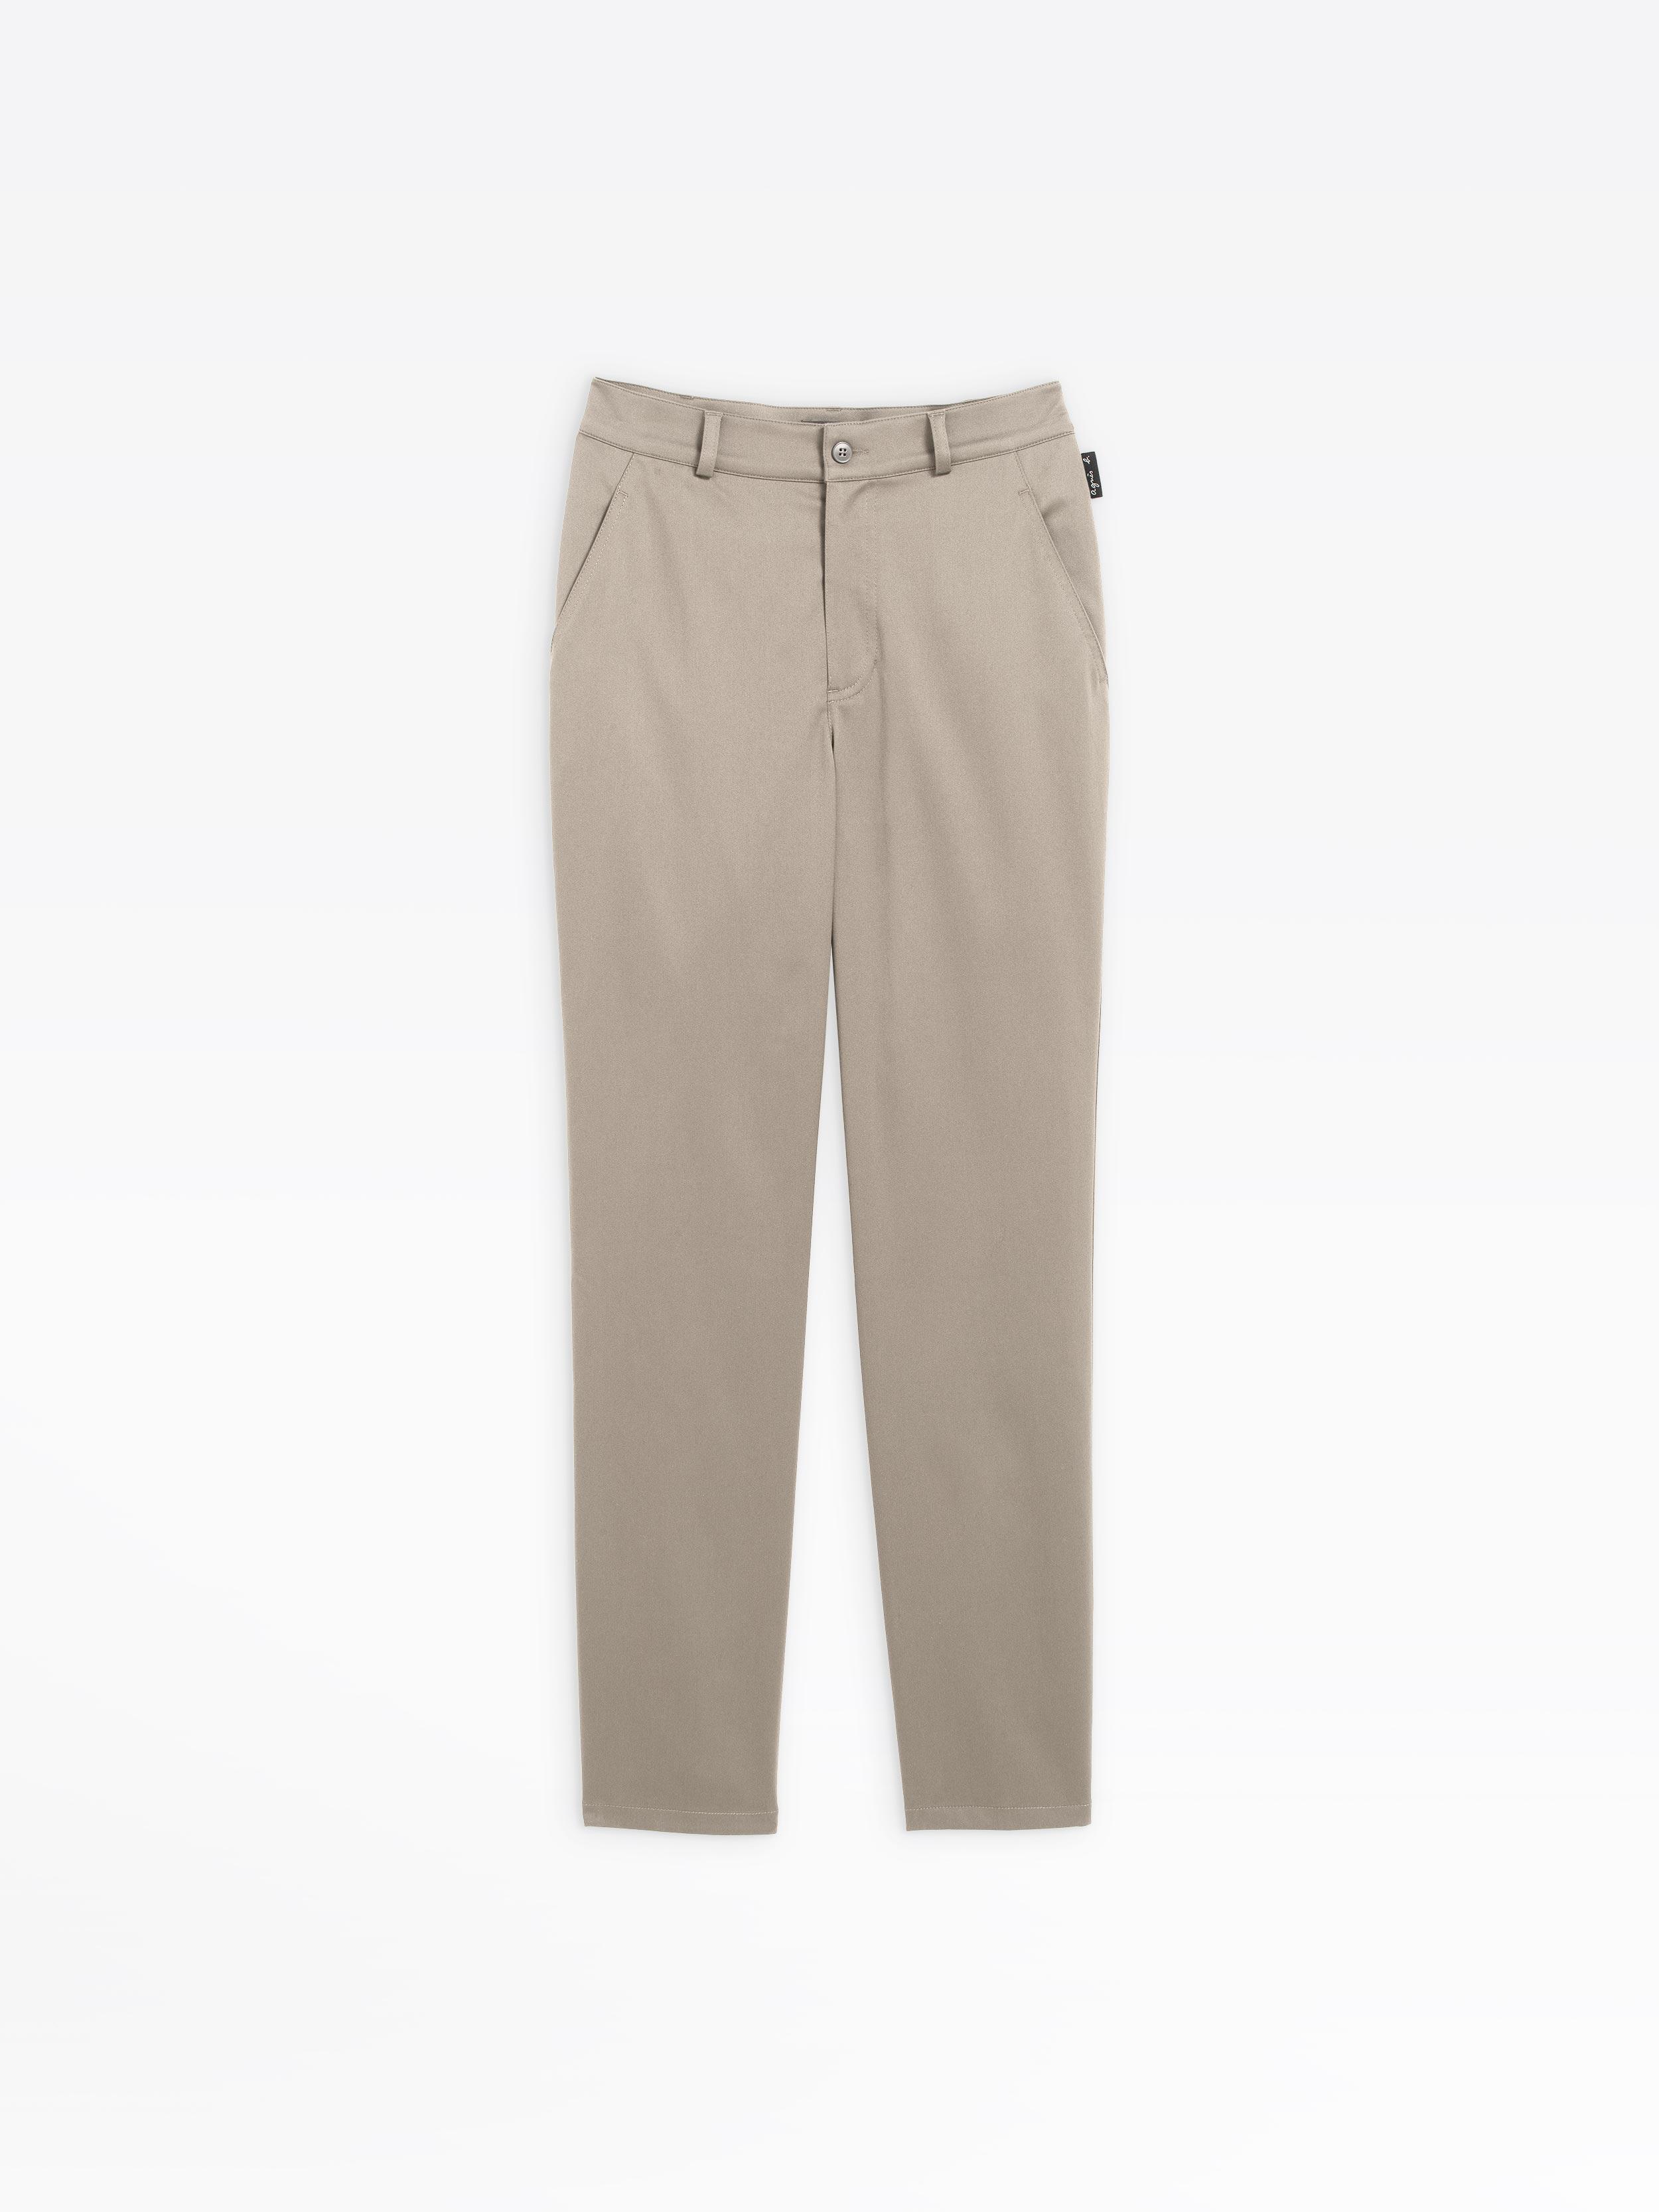 Beige Coton Pantalon En Marilyn Stretch vnwN0Om8